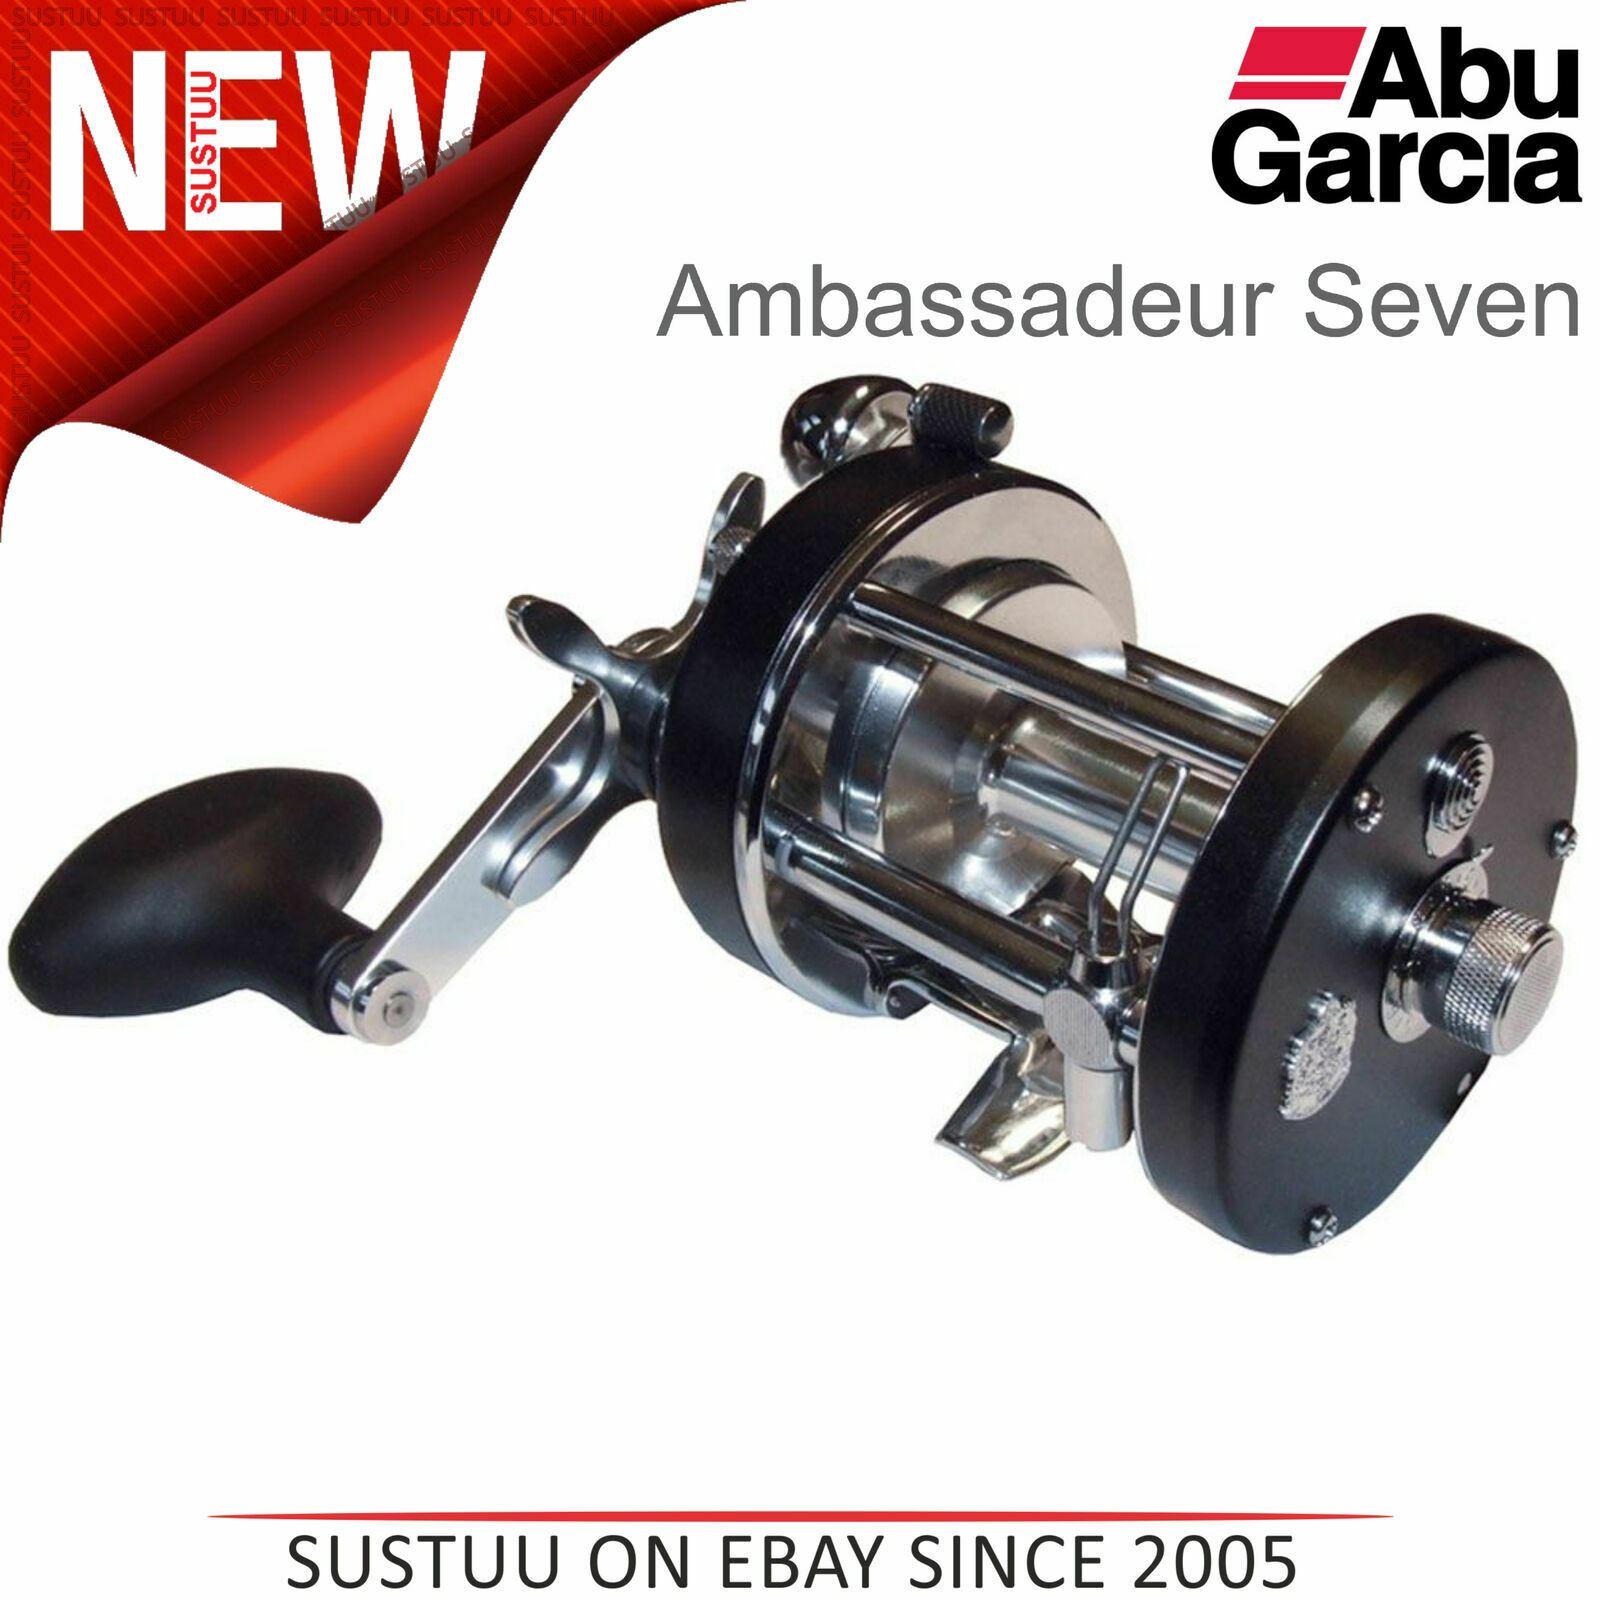 Abu Garcia Ambassadeur Seven Sea Fishing Multiplier Reel 1125243